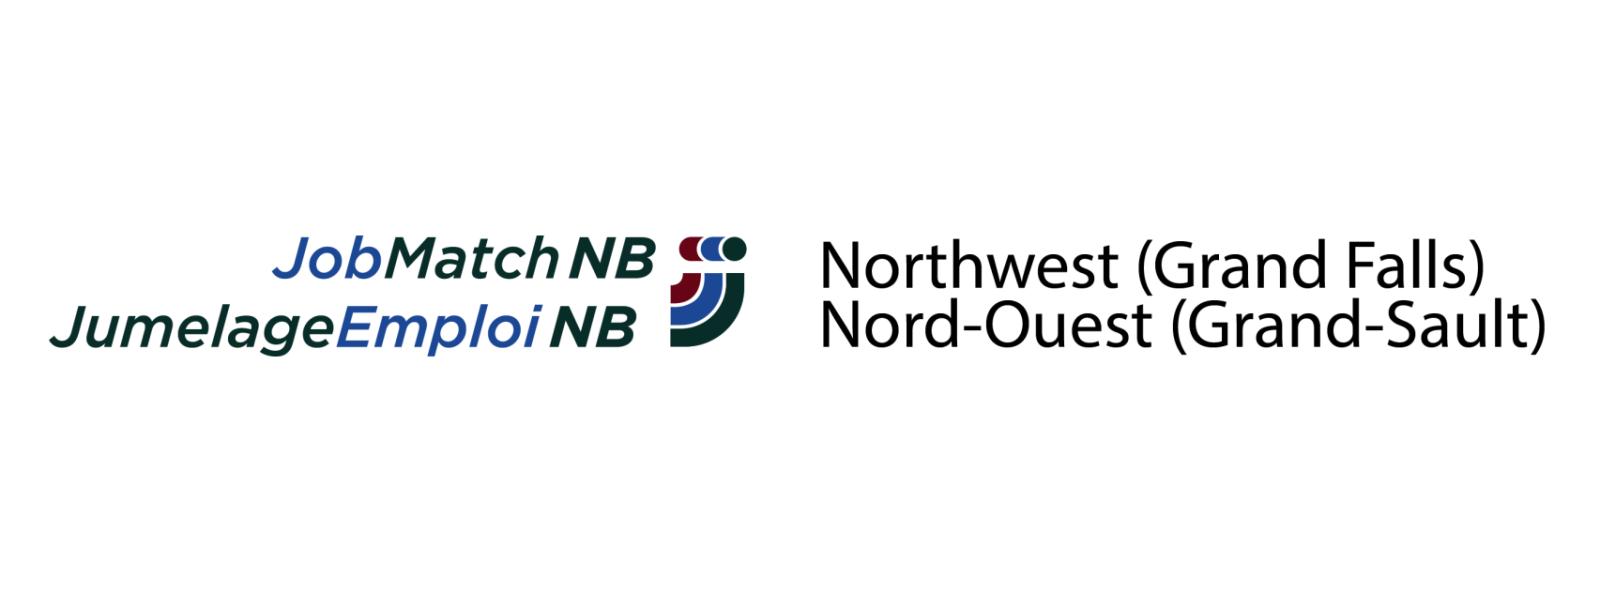 North-West (Grand Falls)